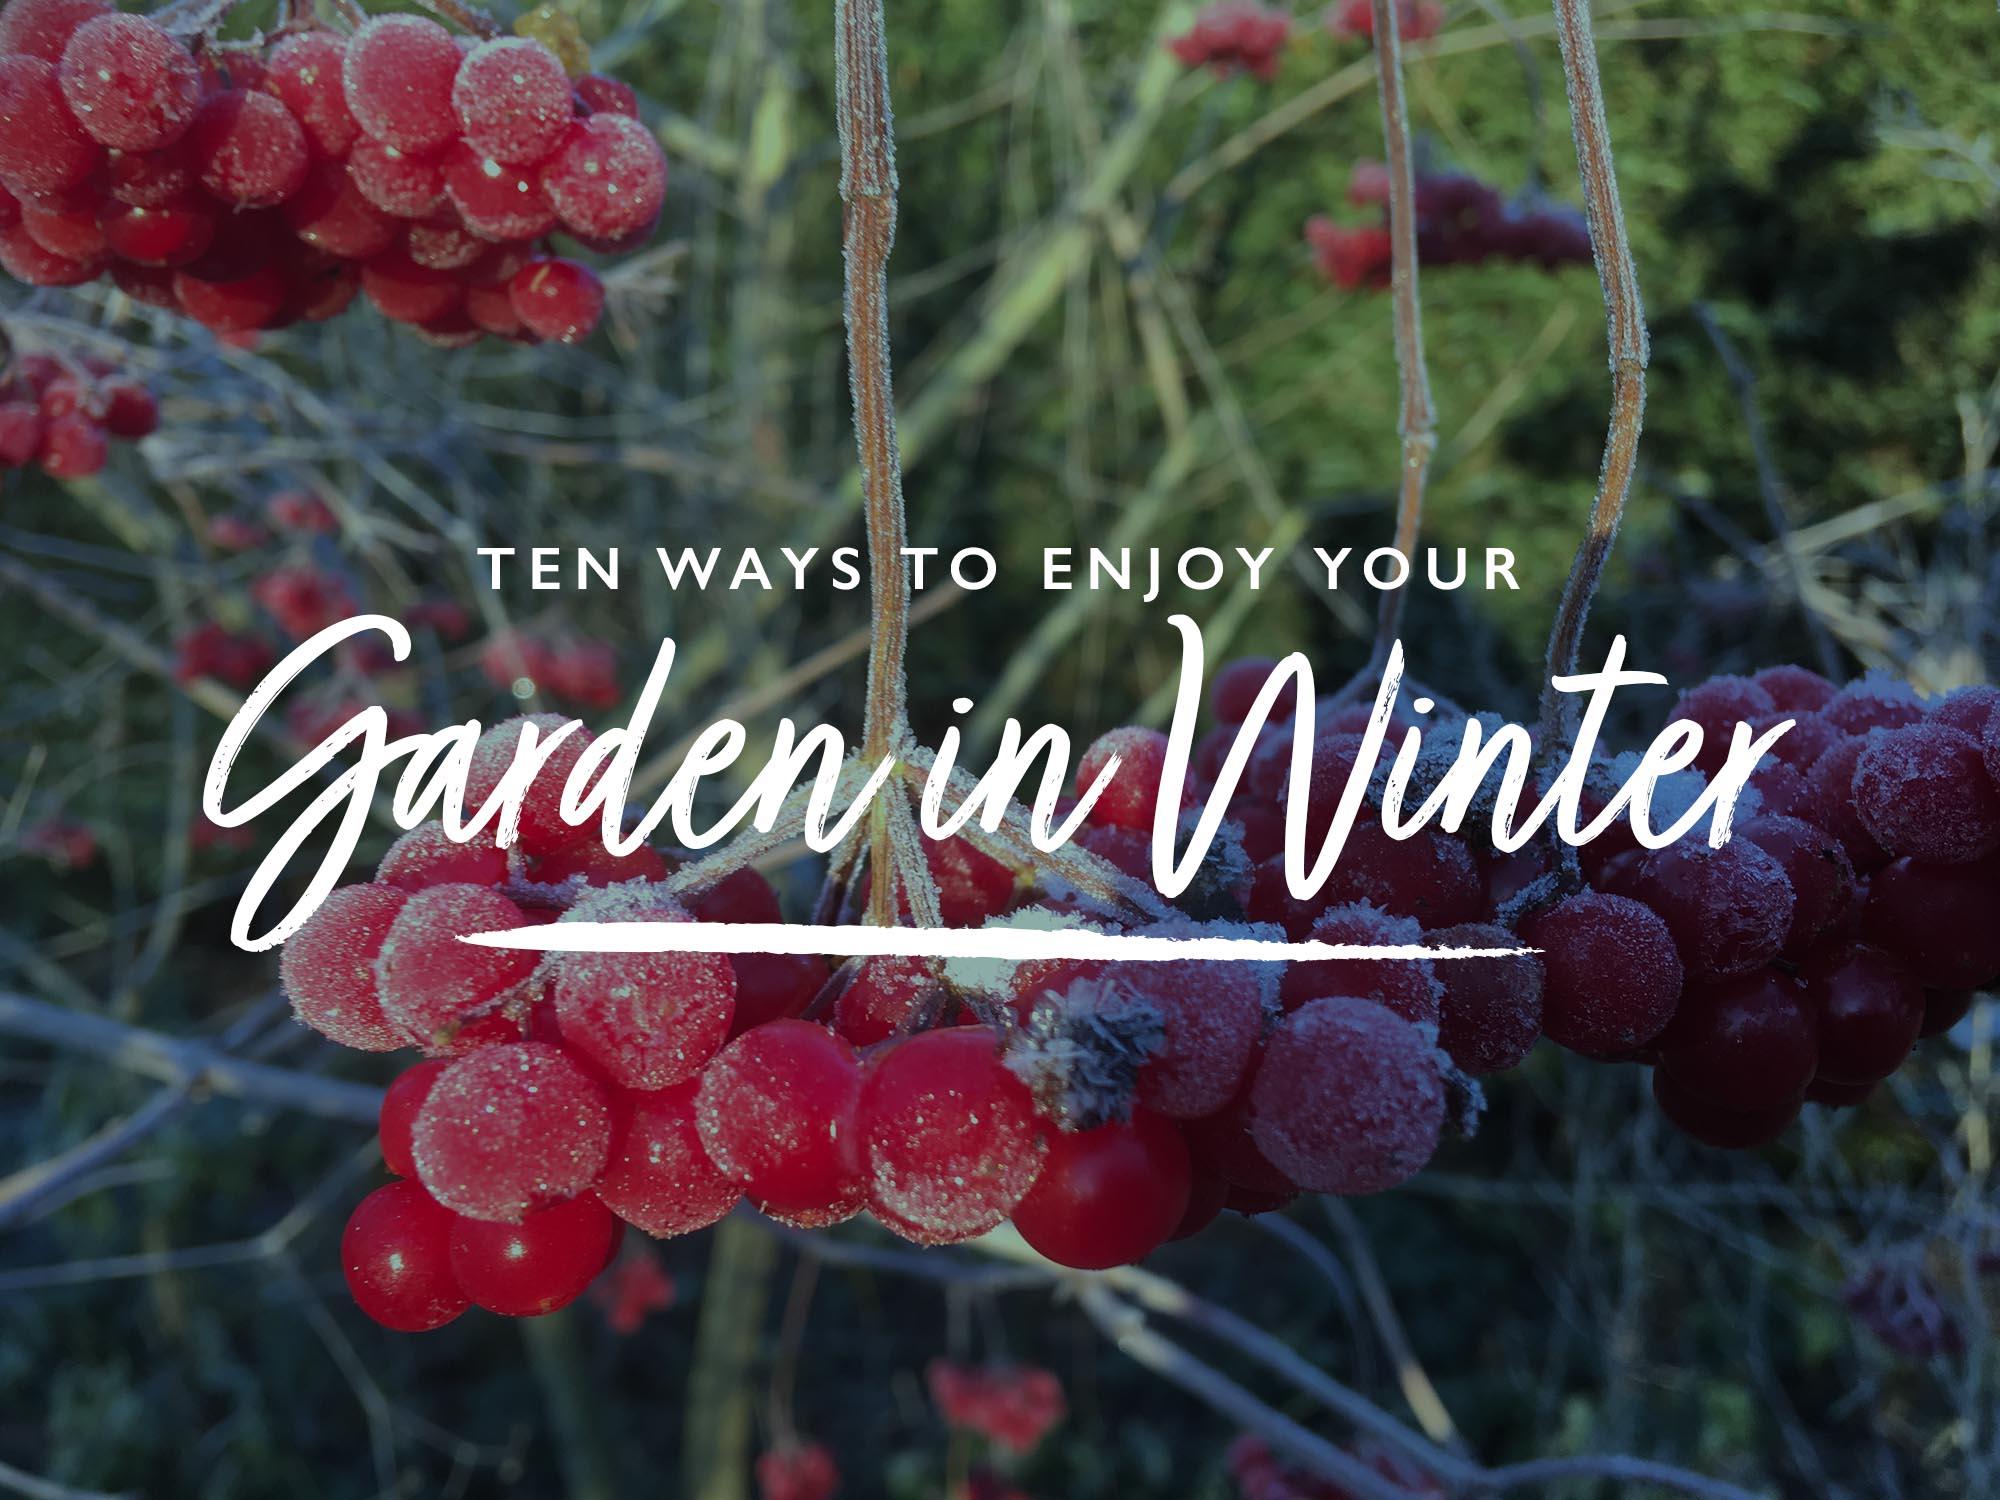 Ten ways to enjoy your garden in winter